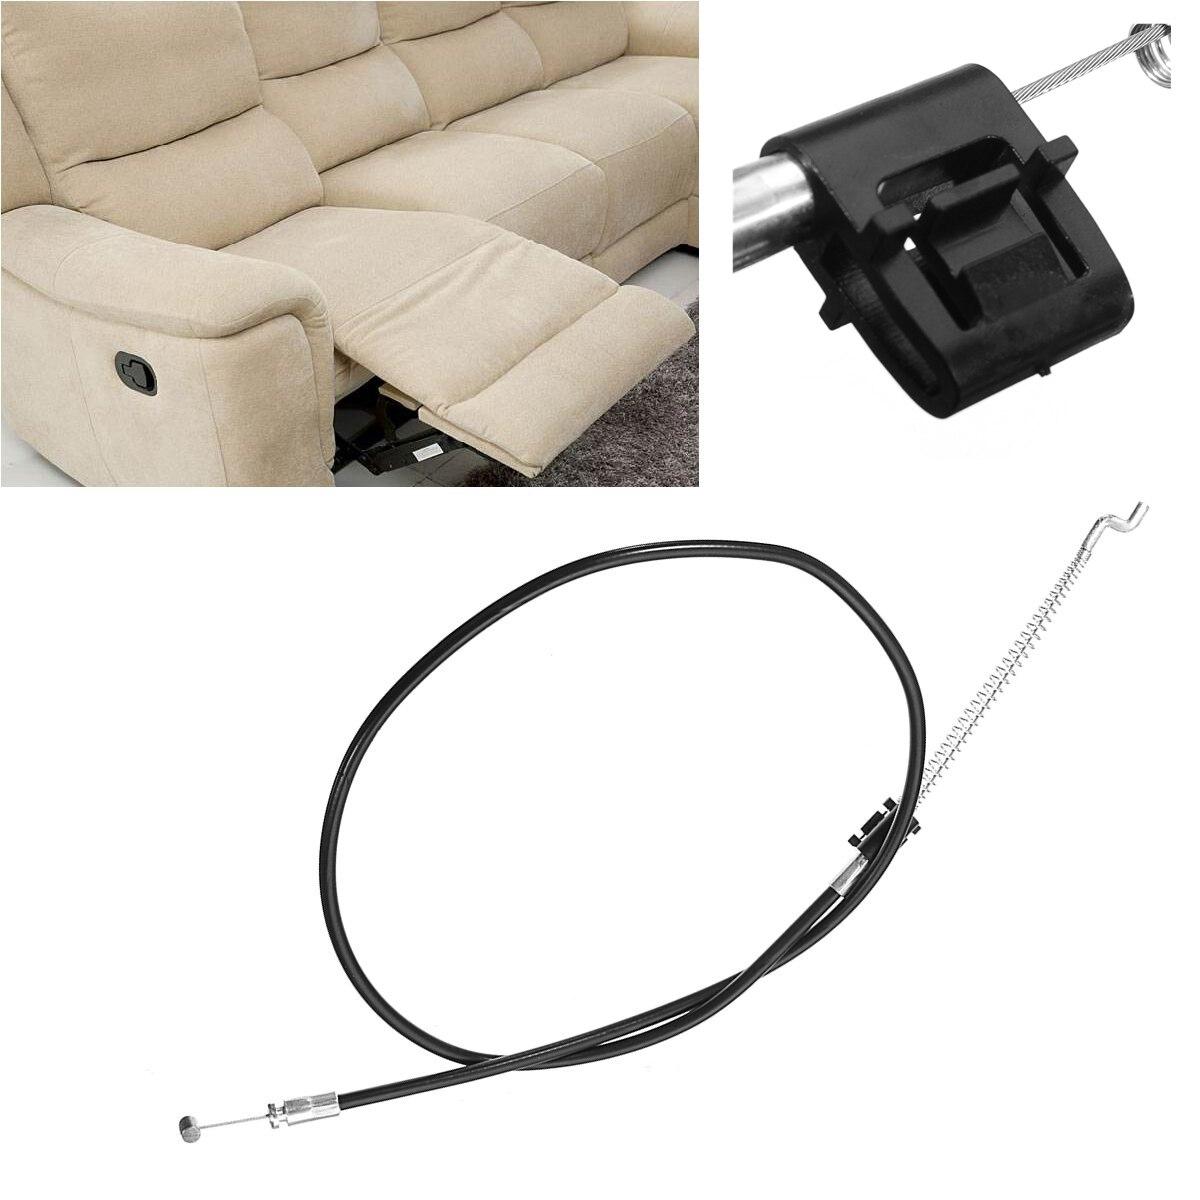 Sofa Stoel Vervanging 14 Cm 90 Cm Auto Fauteuil Handvat Multifunctionele Druk Bar Pull Vervanging Kabel Grote Rassen